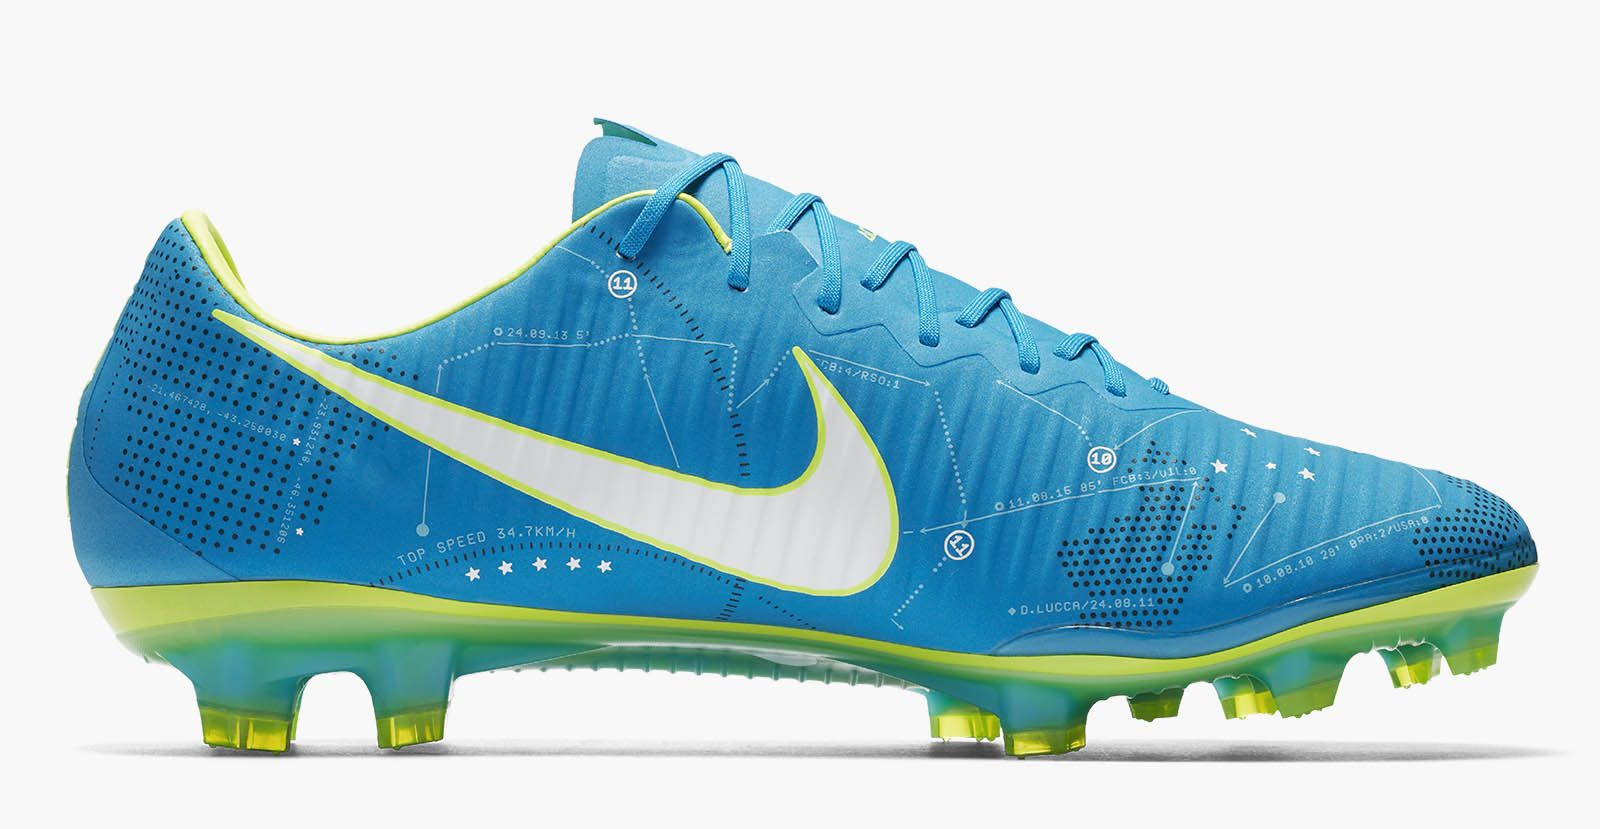 Image result for Nike Mercurial Vapor XI Neymar 2017 Signature Boots